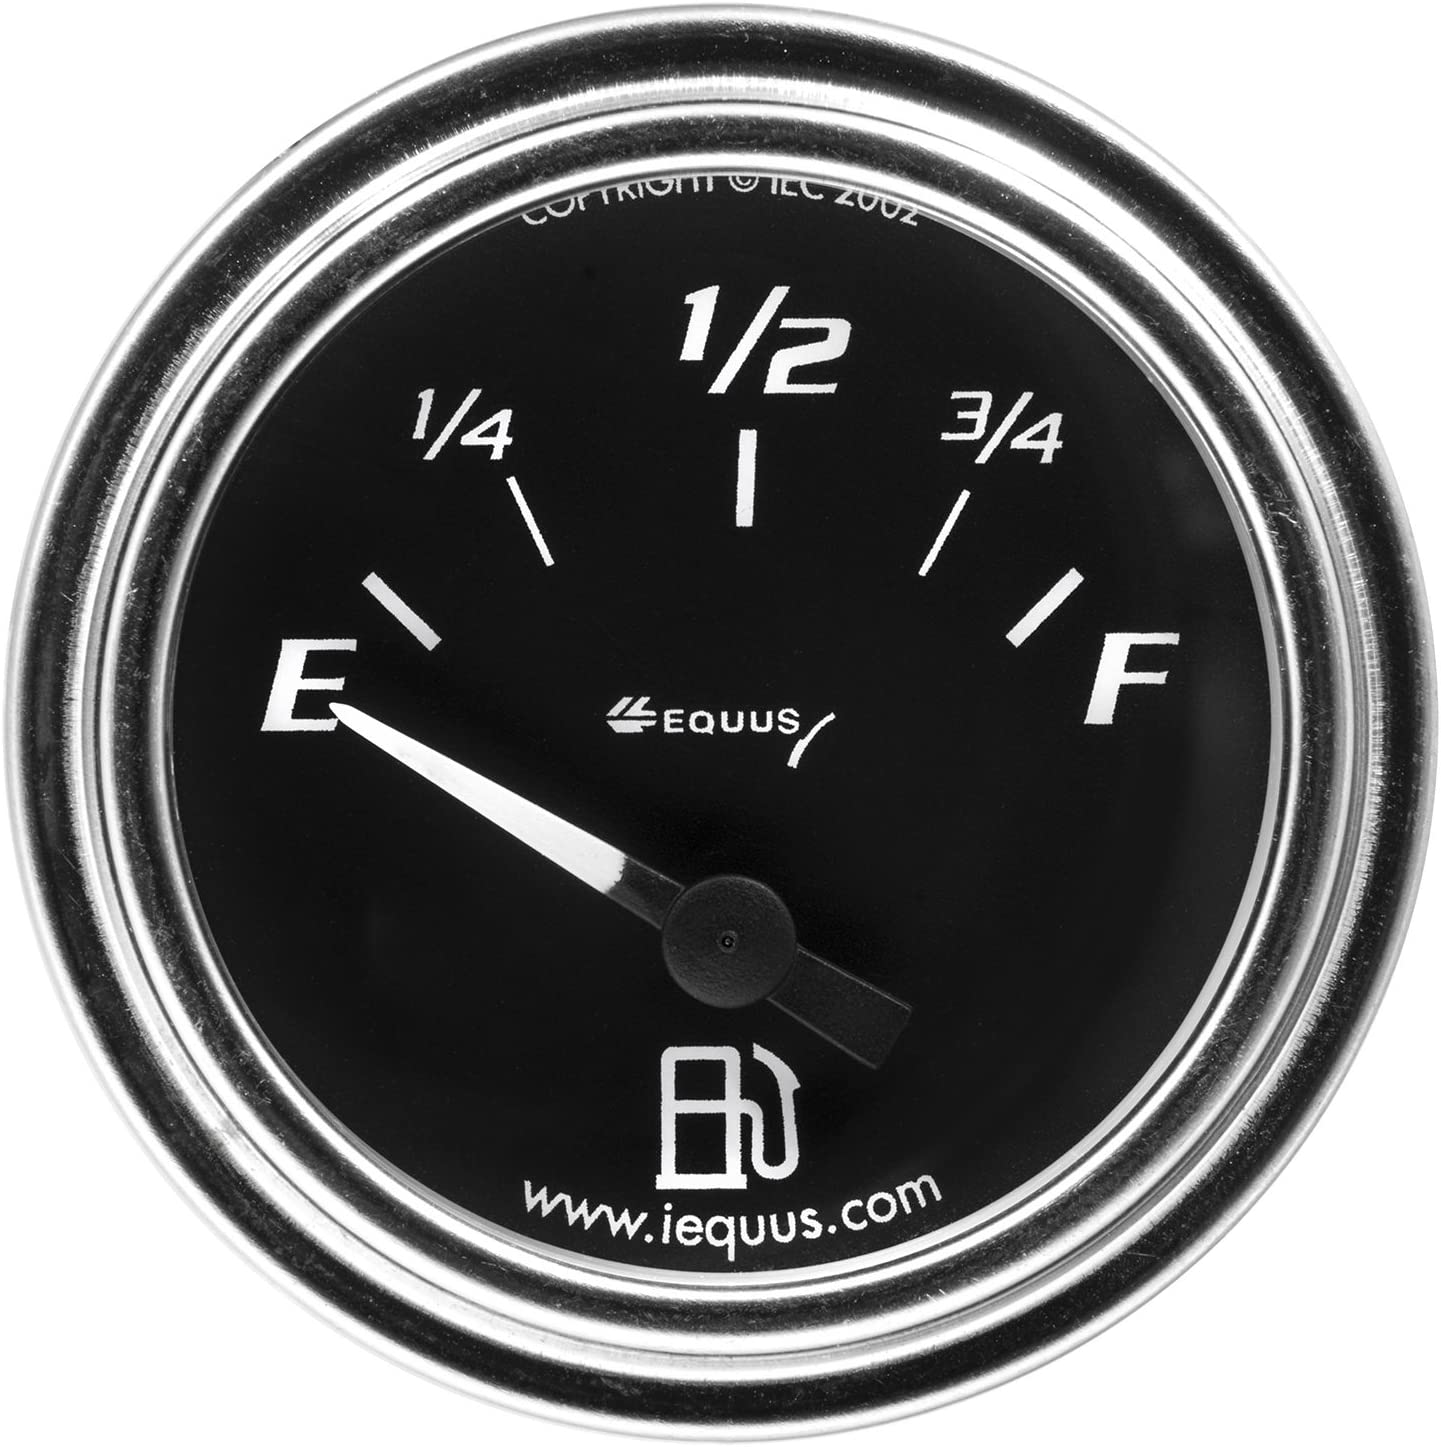 "Equus 7362 2"" Fuel Level Gauge, Chrome with Black Dial"